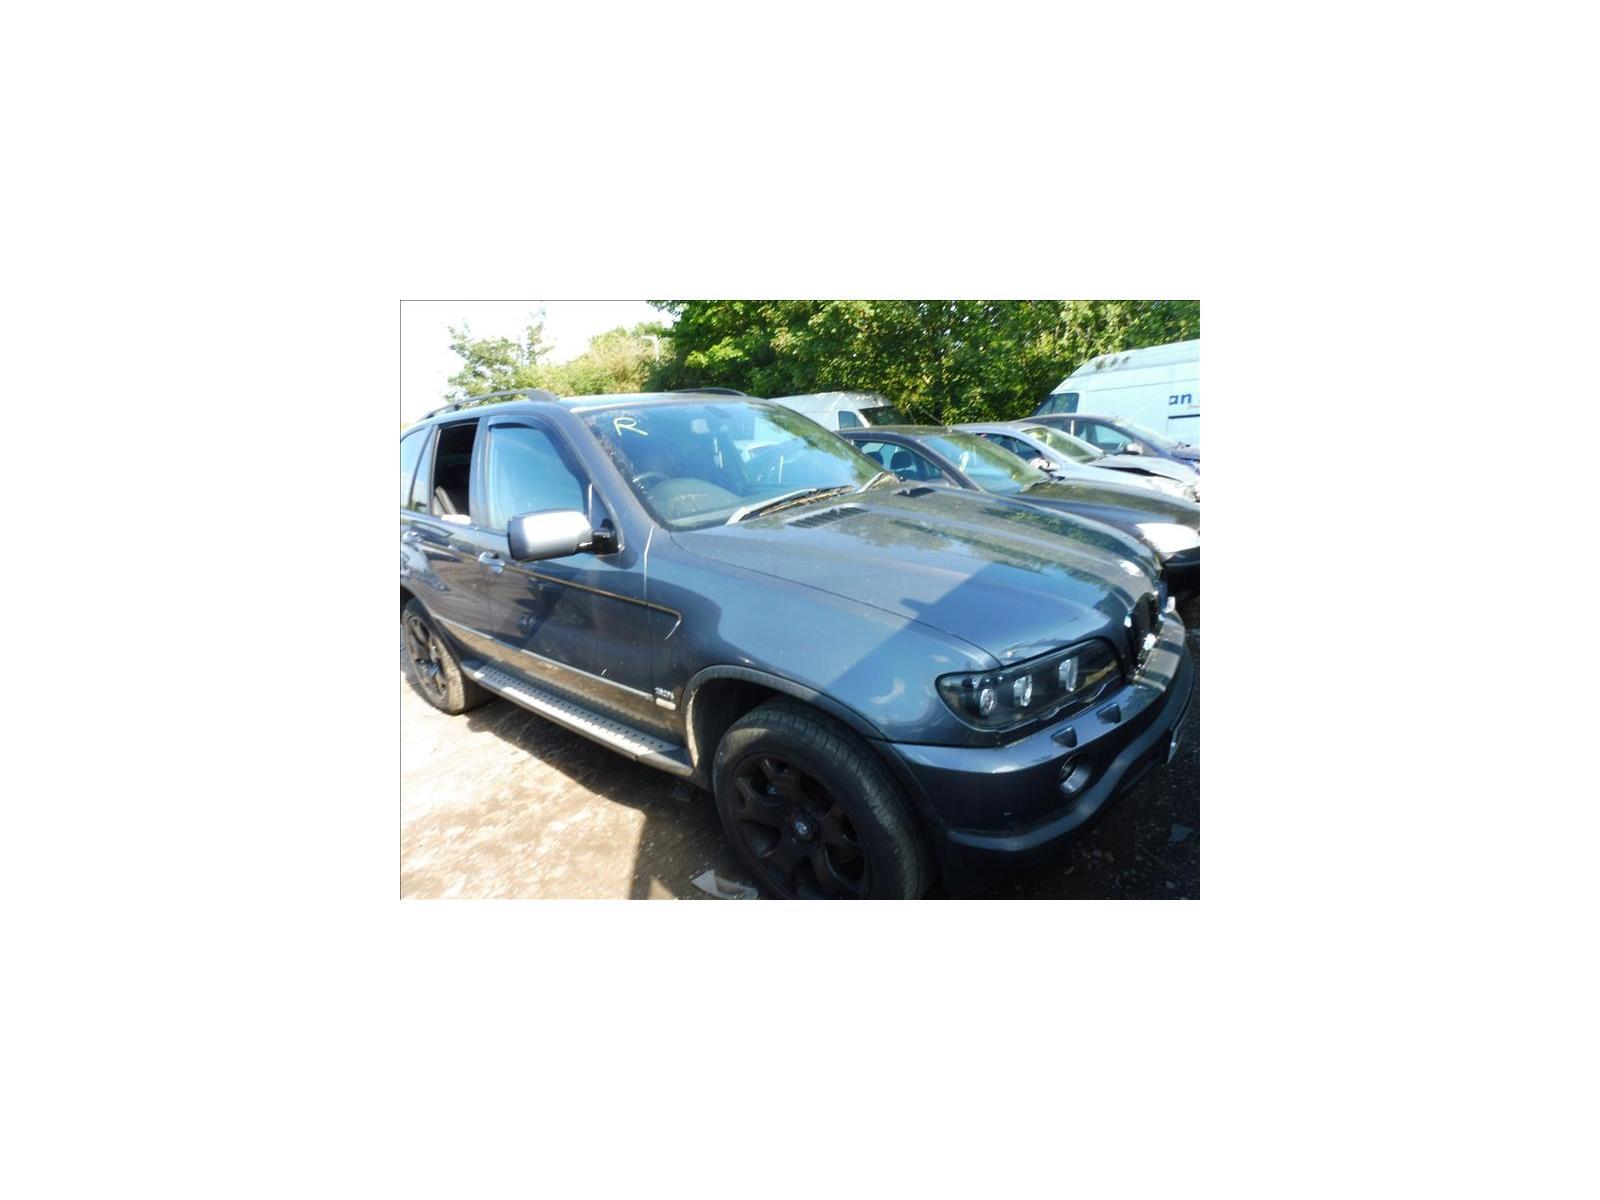 BMW X5 (SPORT 24V) SPORT 24V P1050420